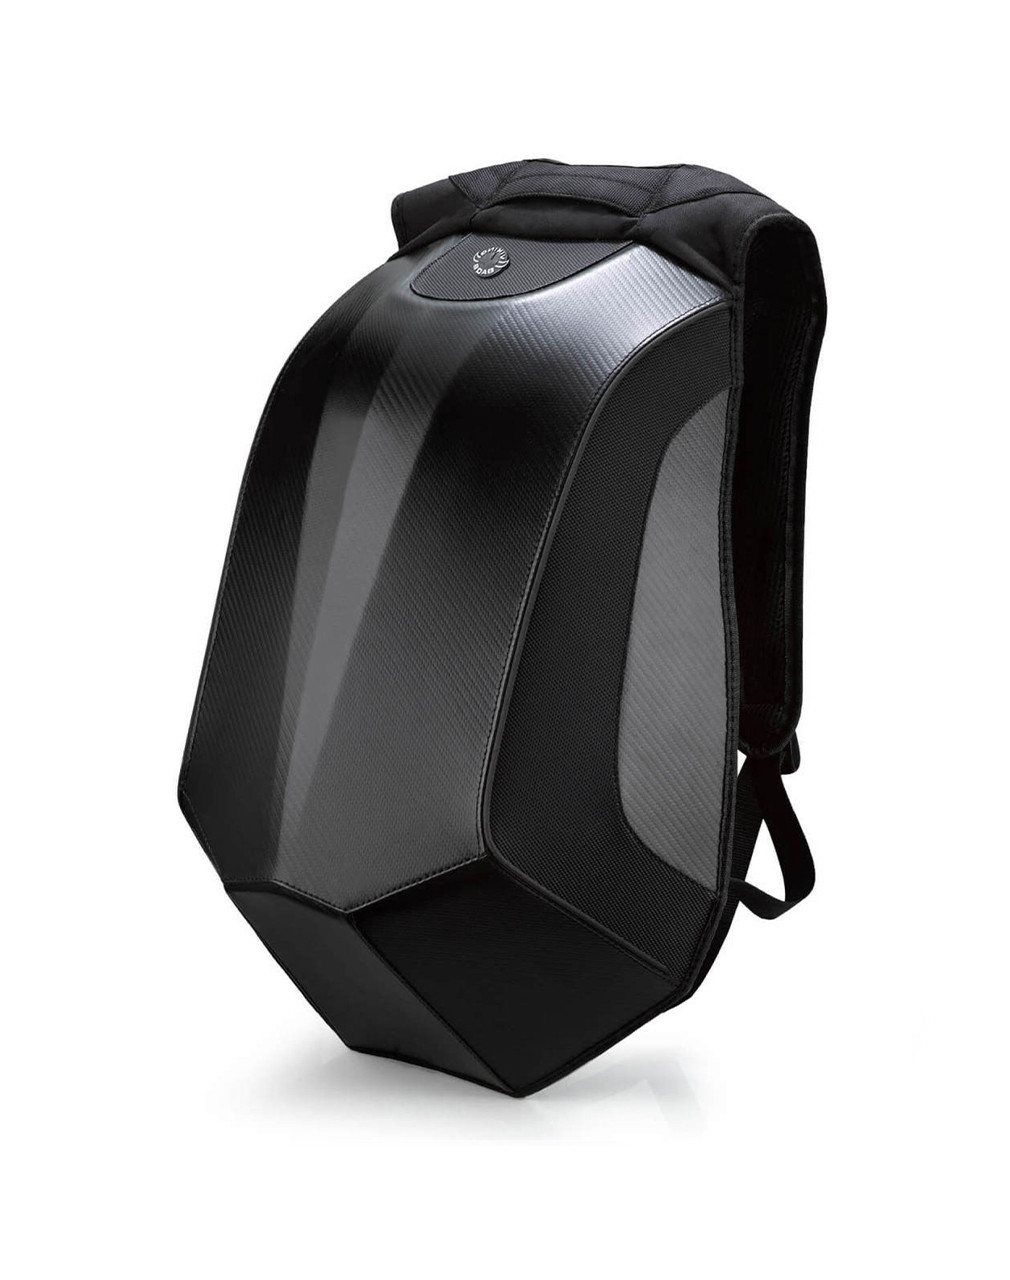 VikingBags Velocity Large Black Expandable Victory Motorcycle Backpack Main Bag View